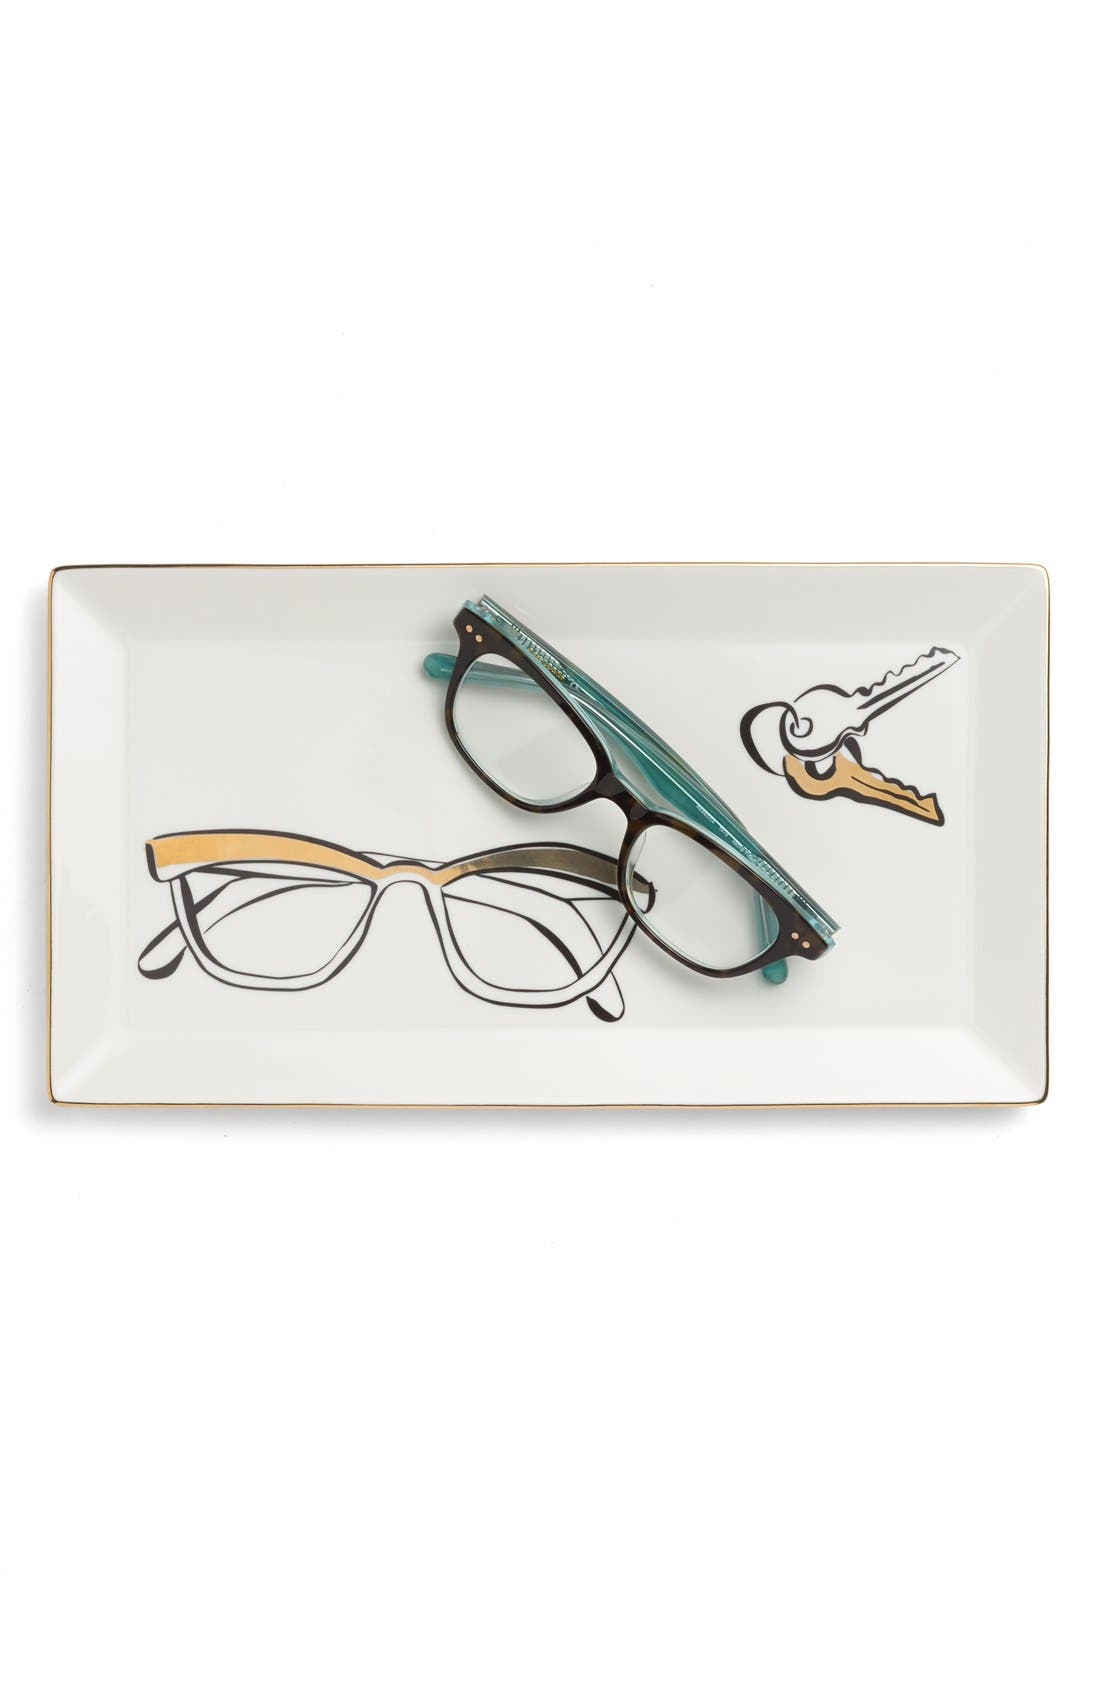 KATE SPADE NEW YORK,                             'eyeglasses' trinket tray,                             Alternate thumbnail 2, color,                             100